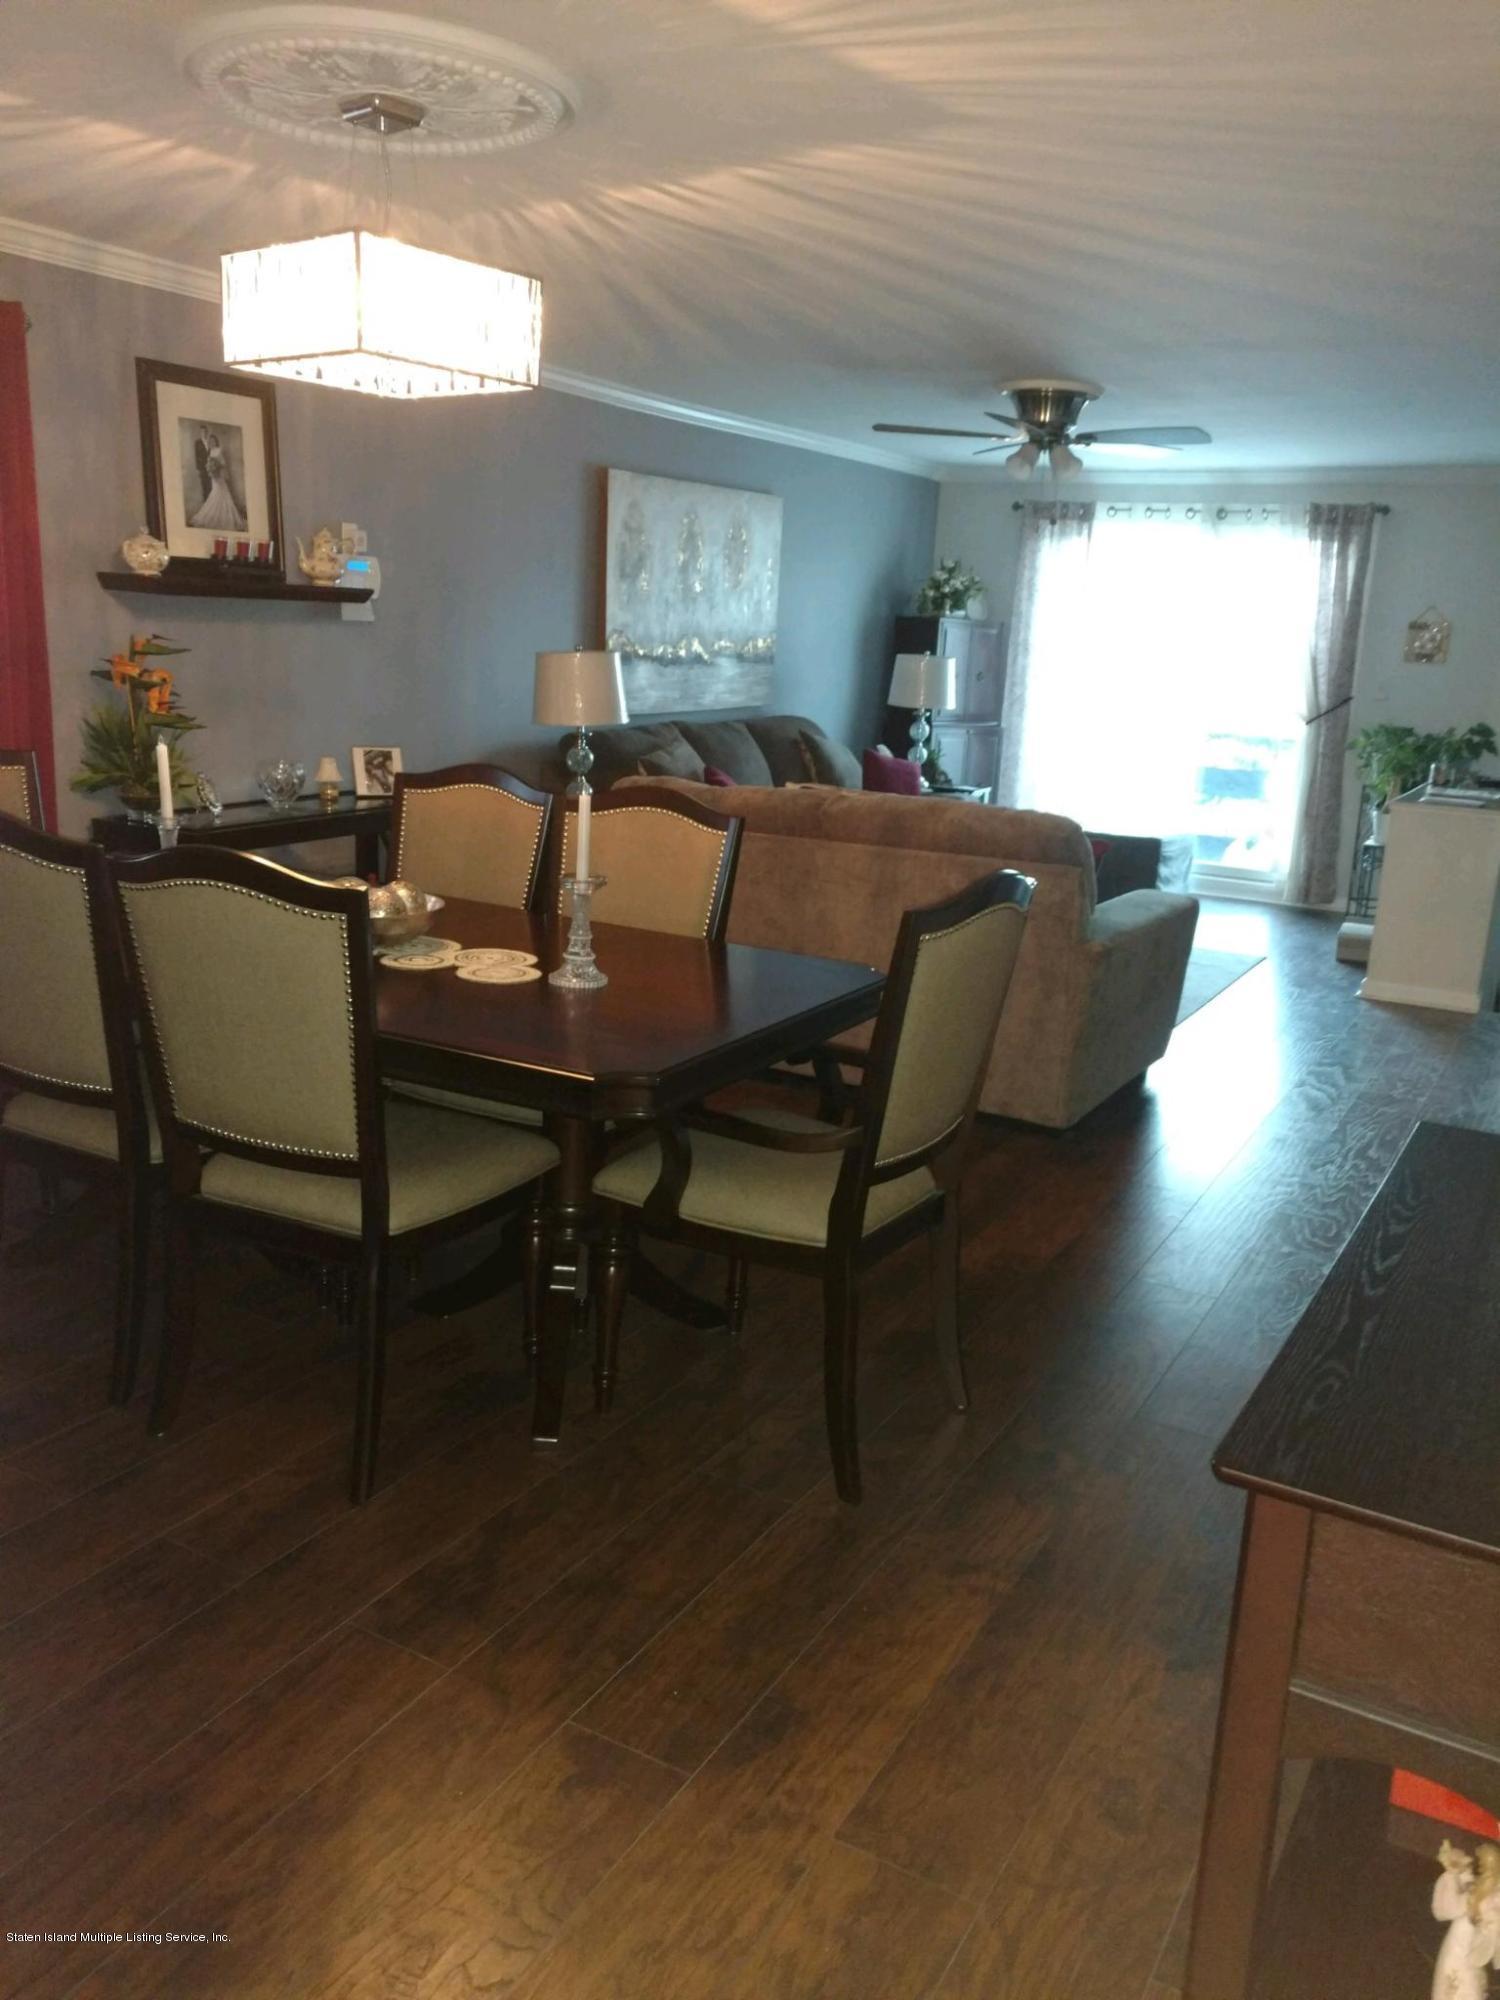 Single Family - Semi-Attached 102 Stack Drive  Staten Island, NY 10312, MLS-1115880-9